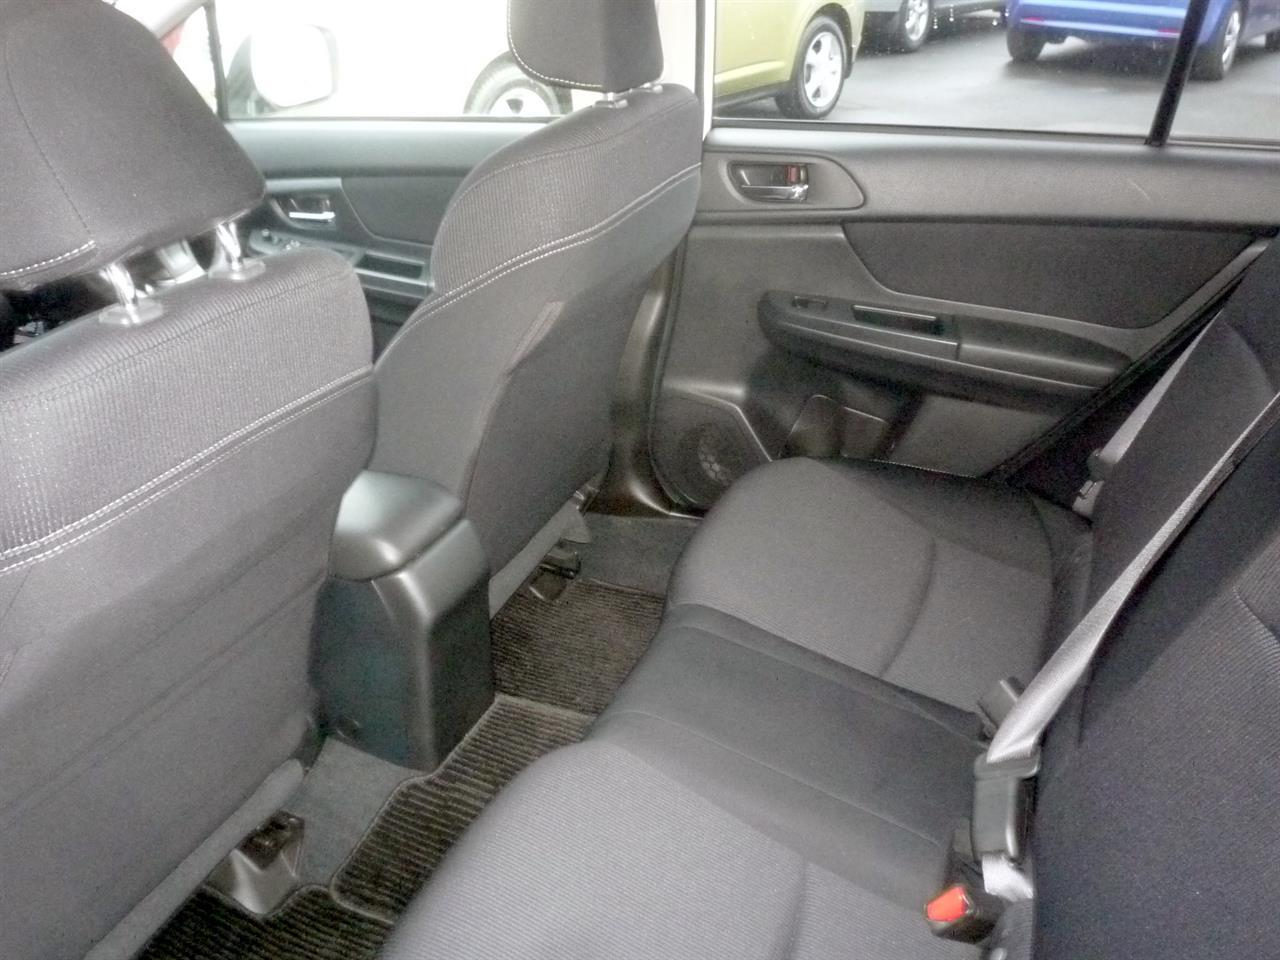 image-5, 2012 Subaru Impreza 1.6i-L 2WD at Dunedin